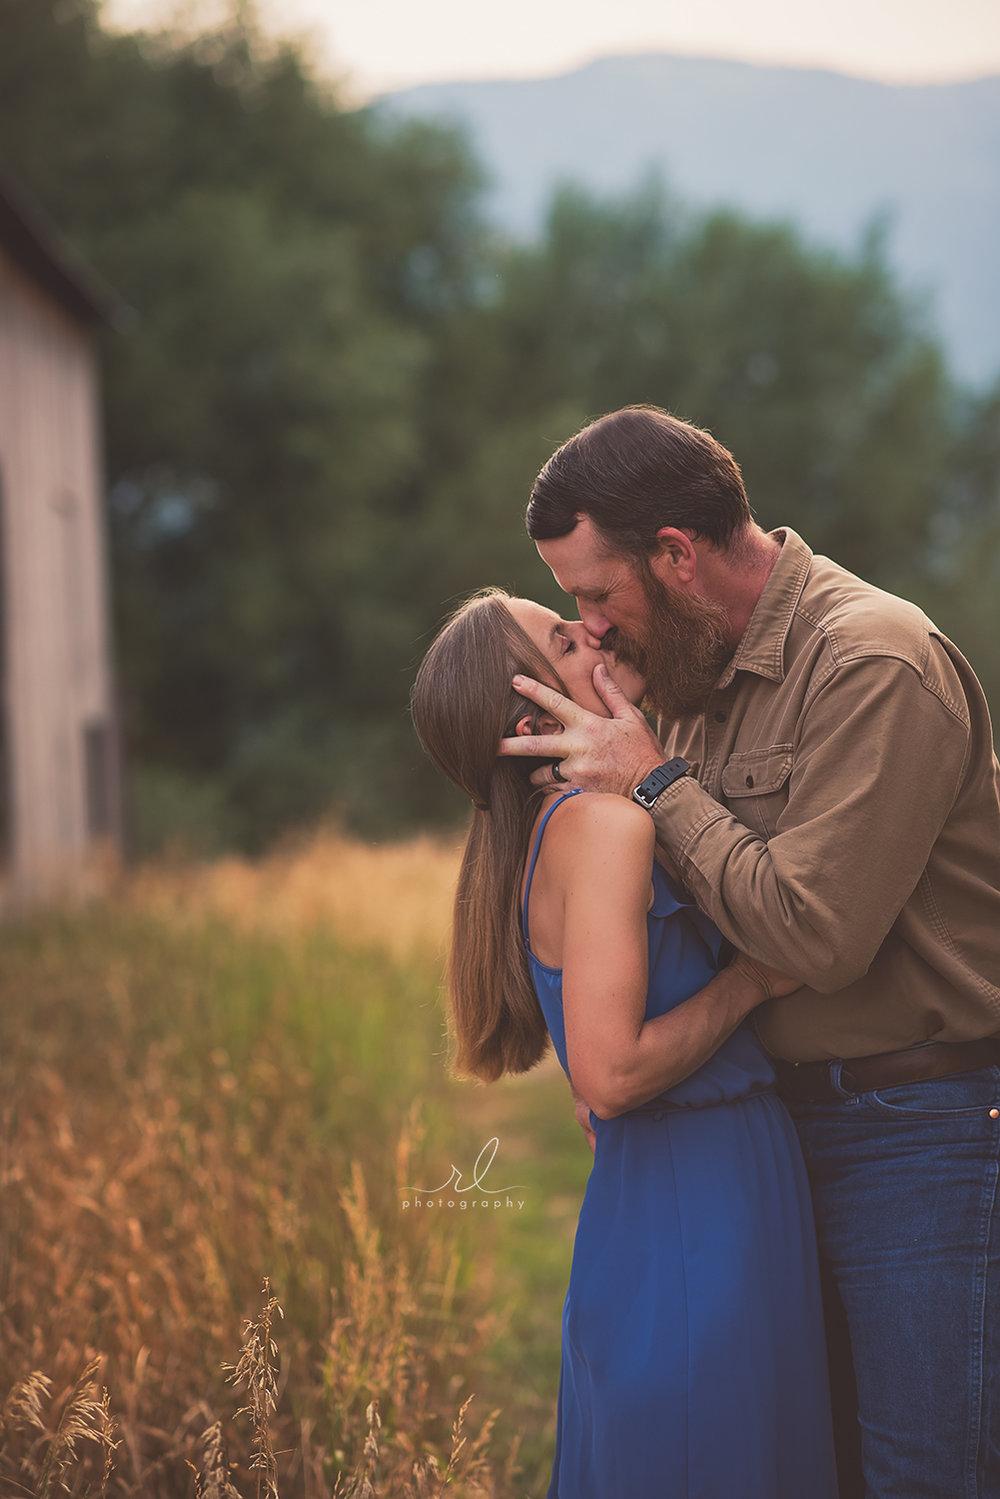 Oklahoma City RL Photography couples 01.jpg